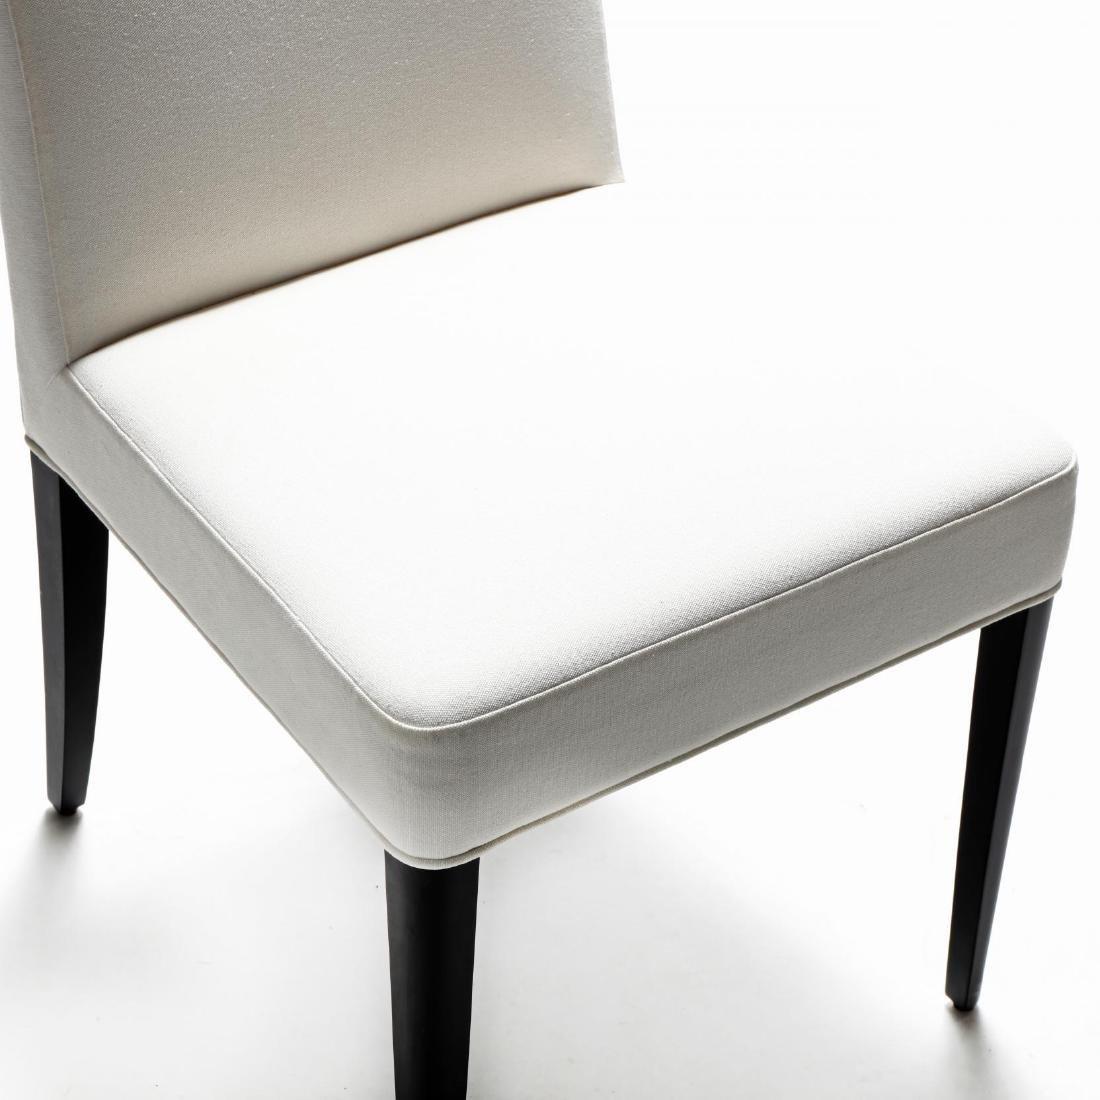 Kara Mann, Set of Four Contemporary Upholstered Dining - 4